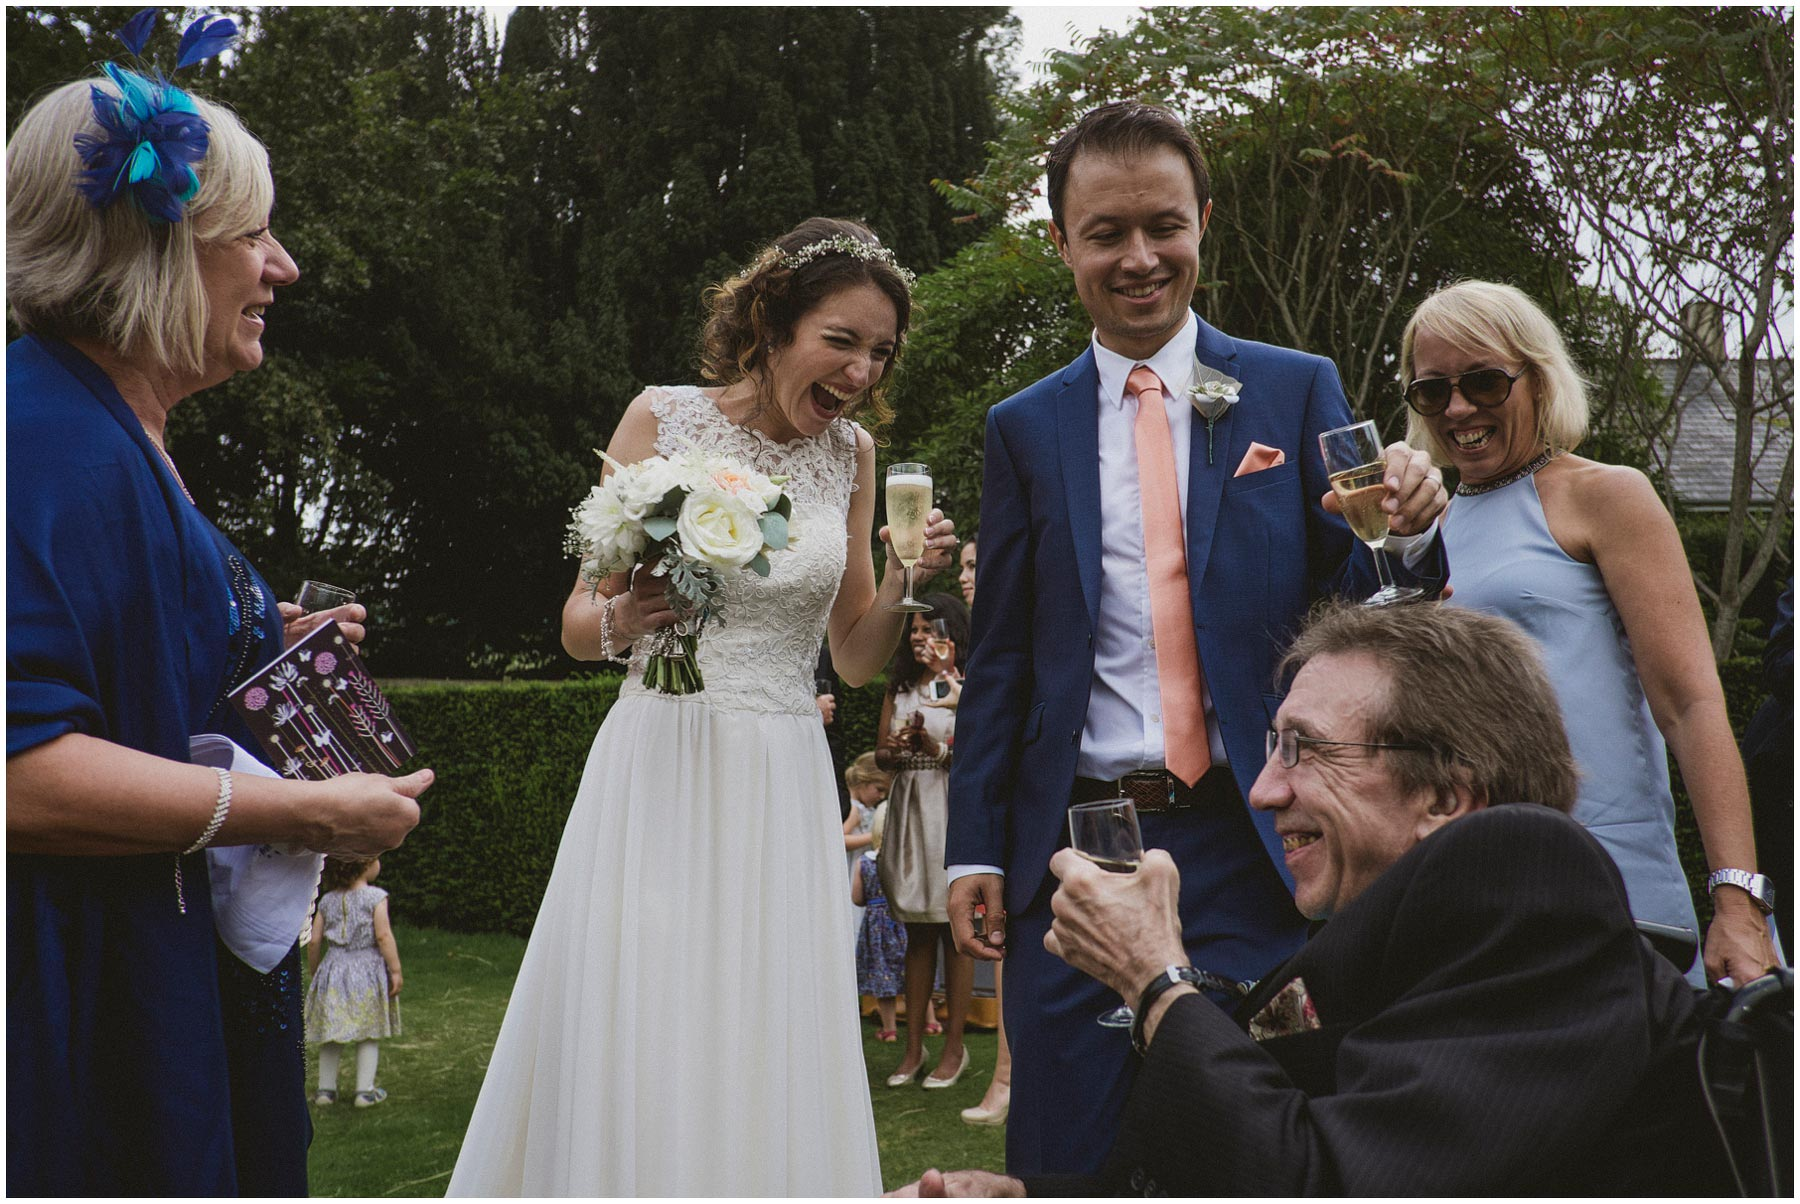 Colehayes-Park-Wedding-Photography_0105